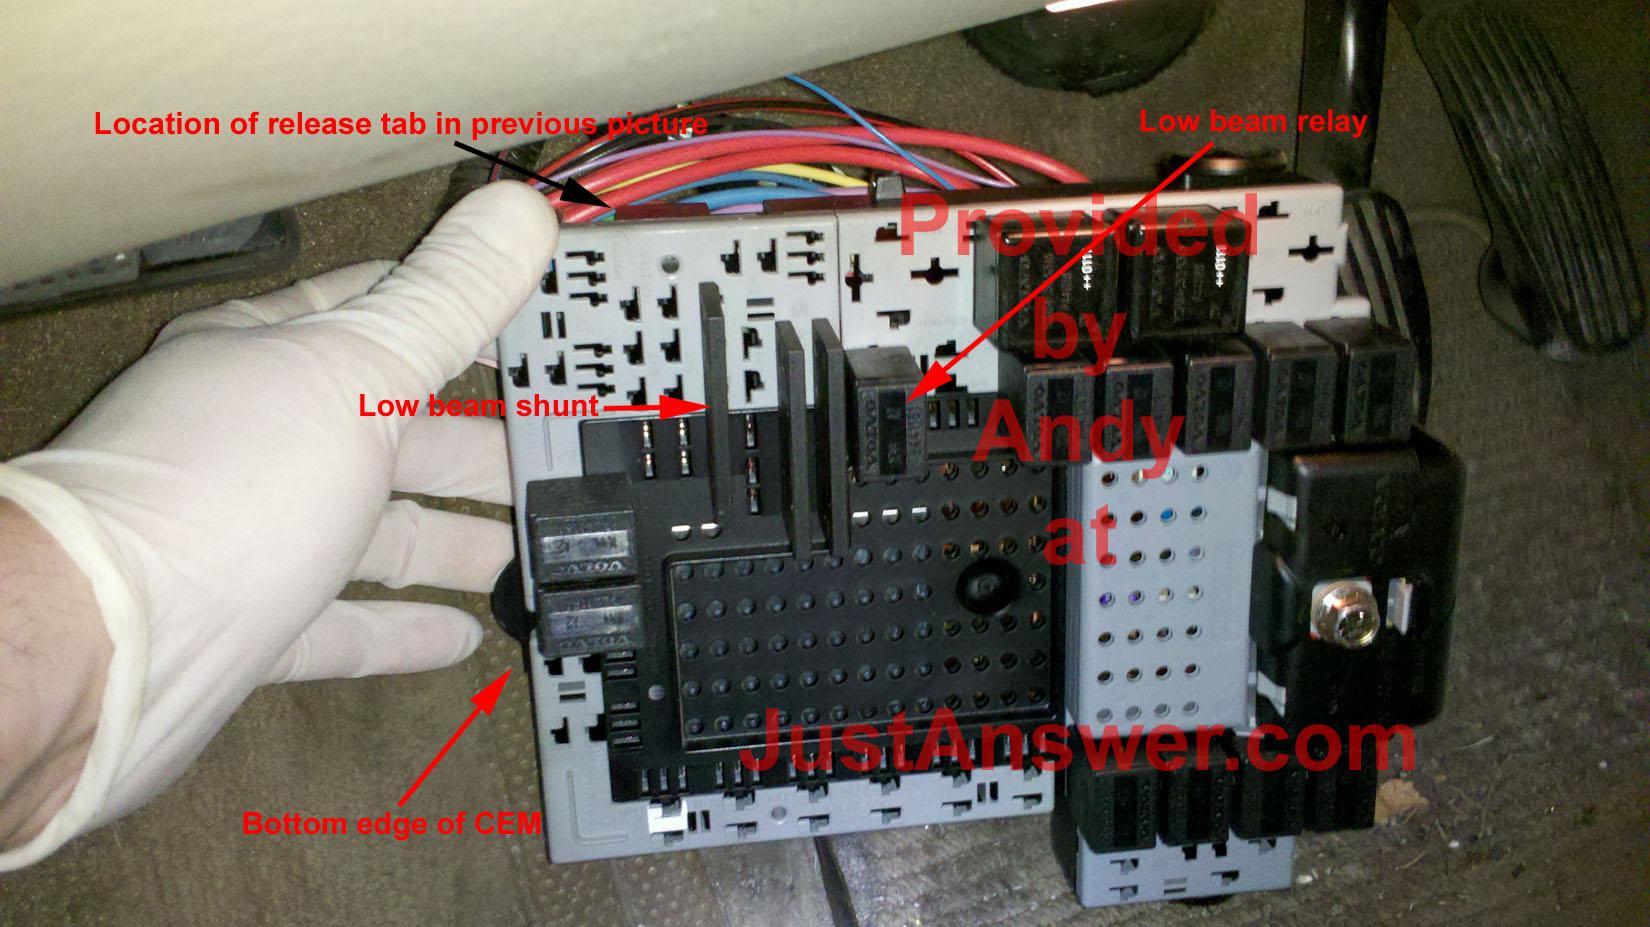 2004 volvo s80 fuse diagram ws 1497  volvo xc90 fuse box removal wiring diagram  volvo xc90 fuse box removal wiring diagram